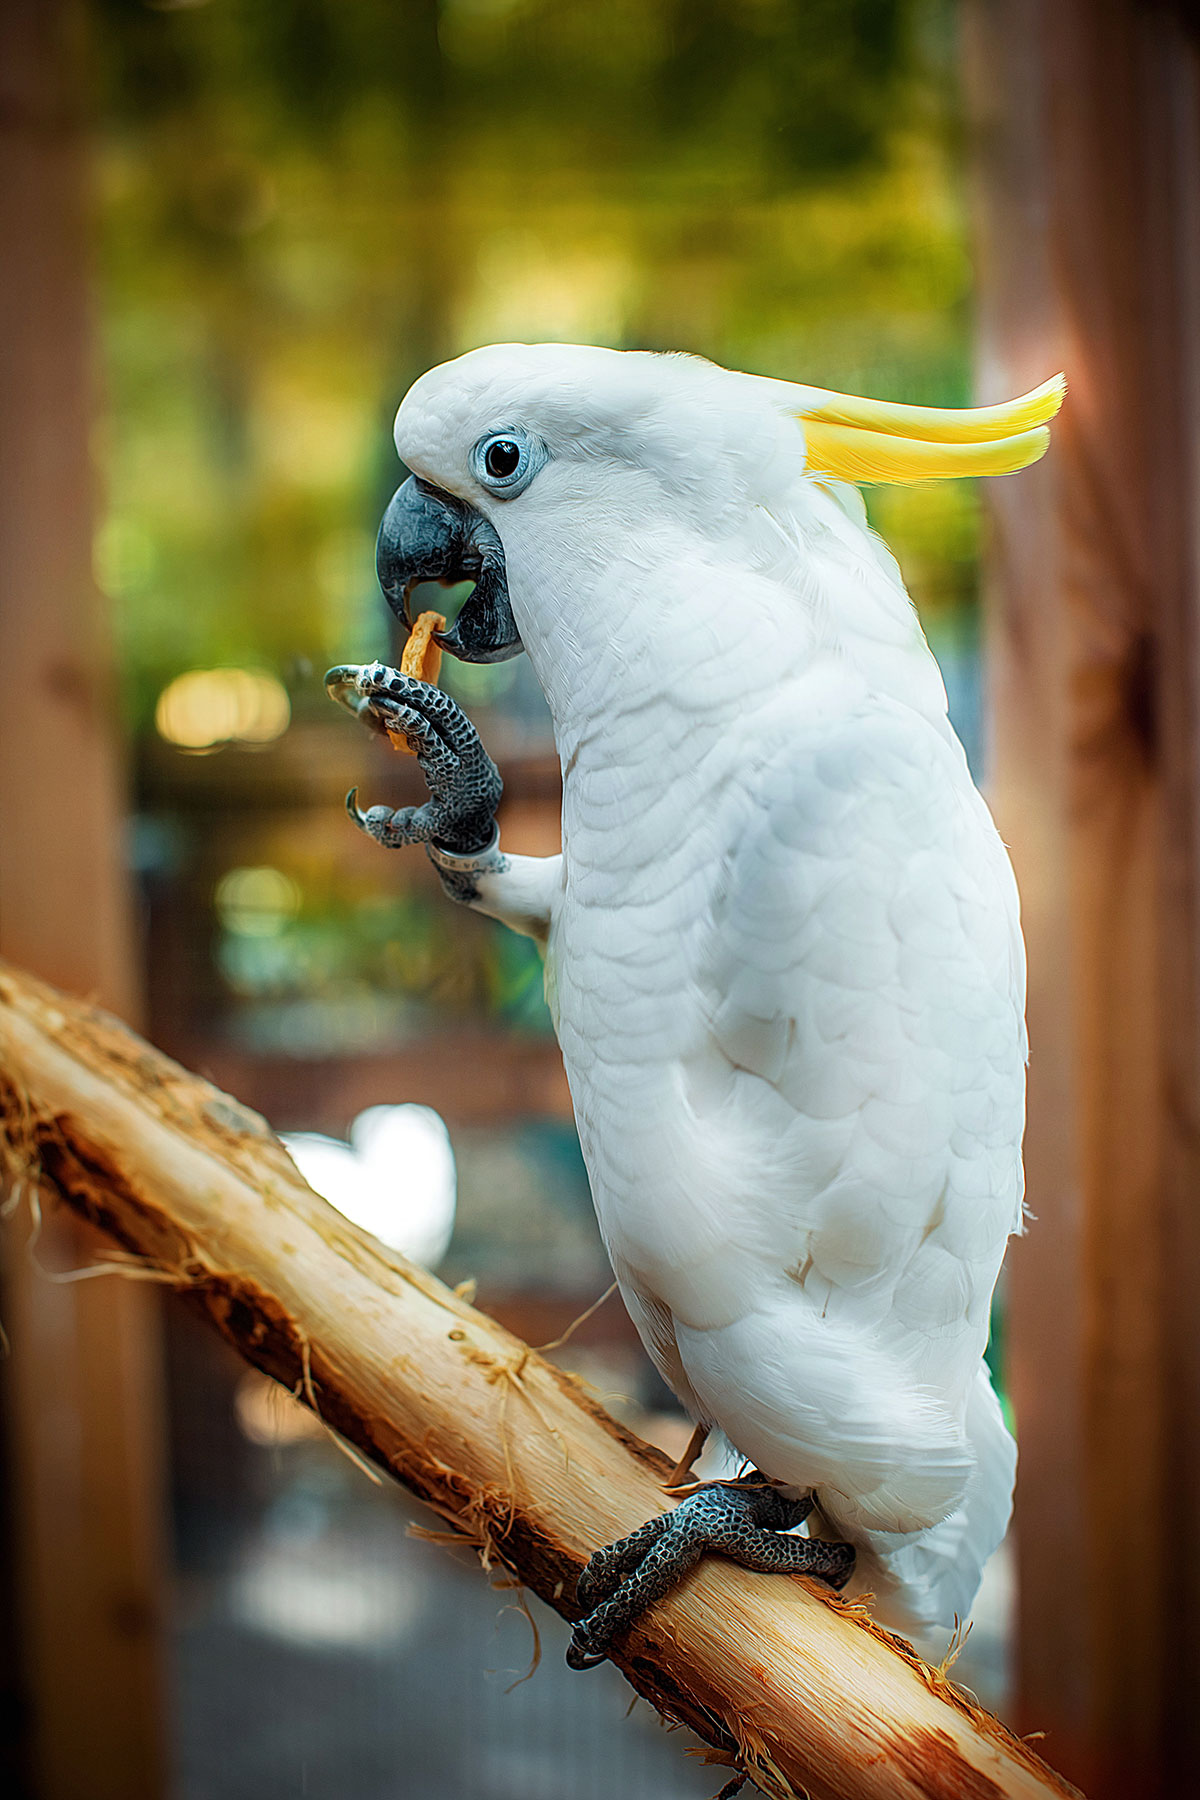 Жовточубий какаду — контактний зоопарк Animal Park